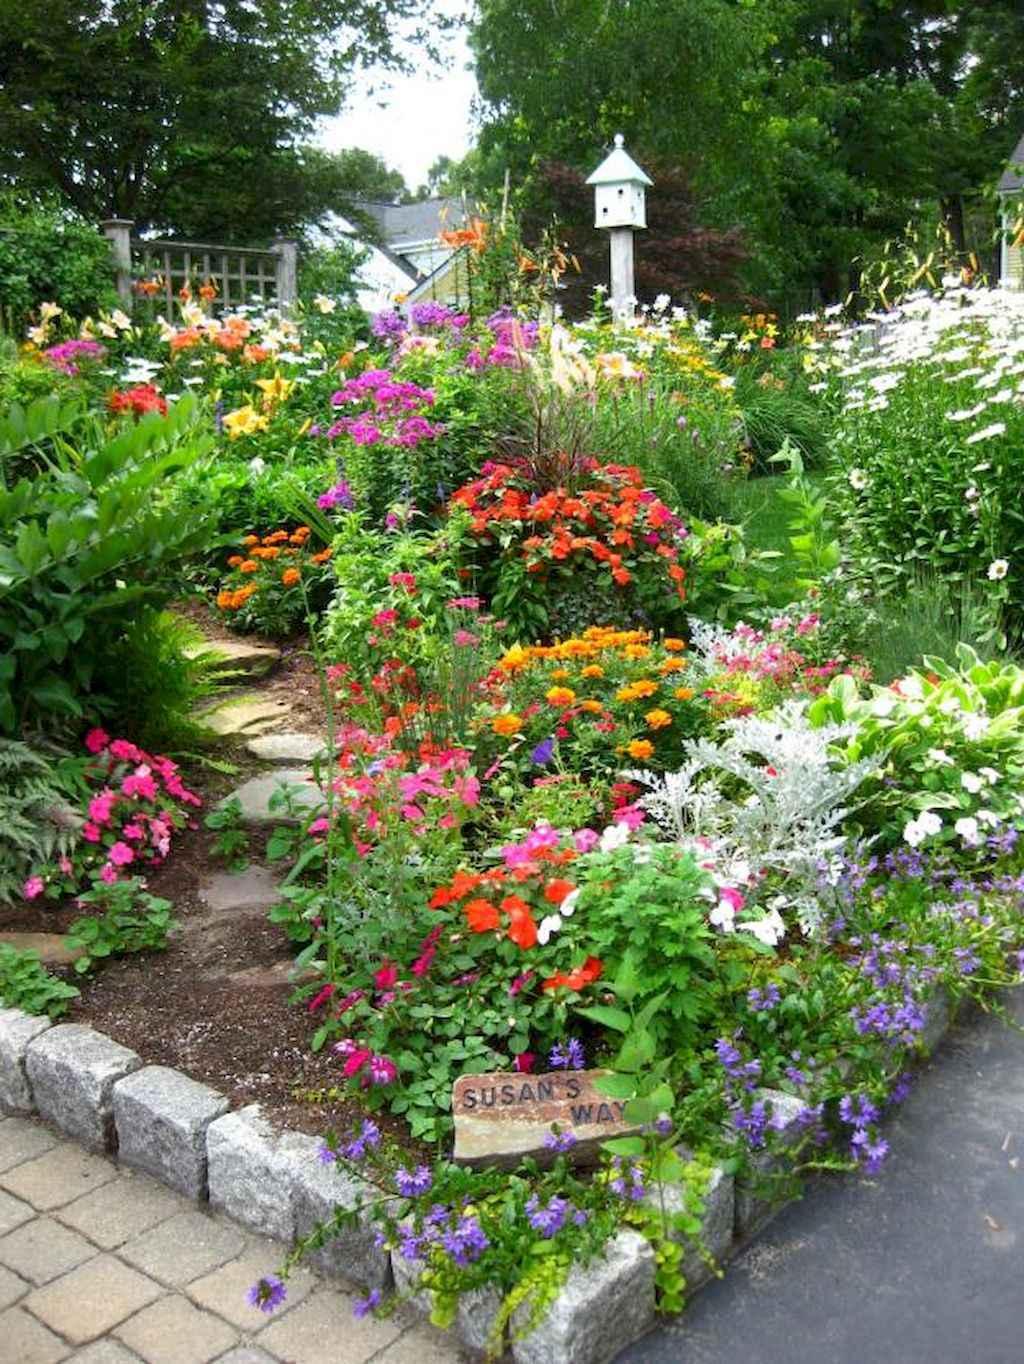 50 cheap and easy flower garden ideas (17)